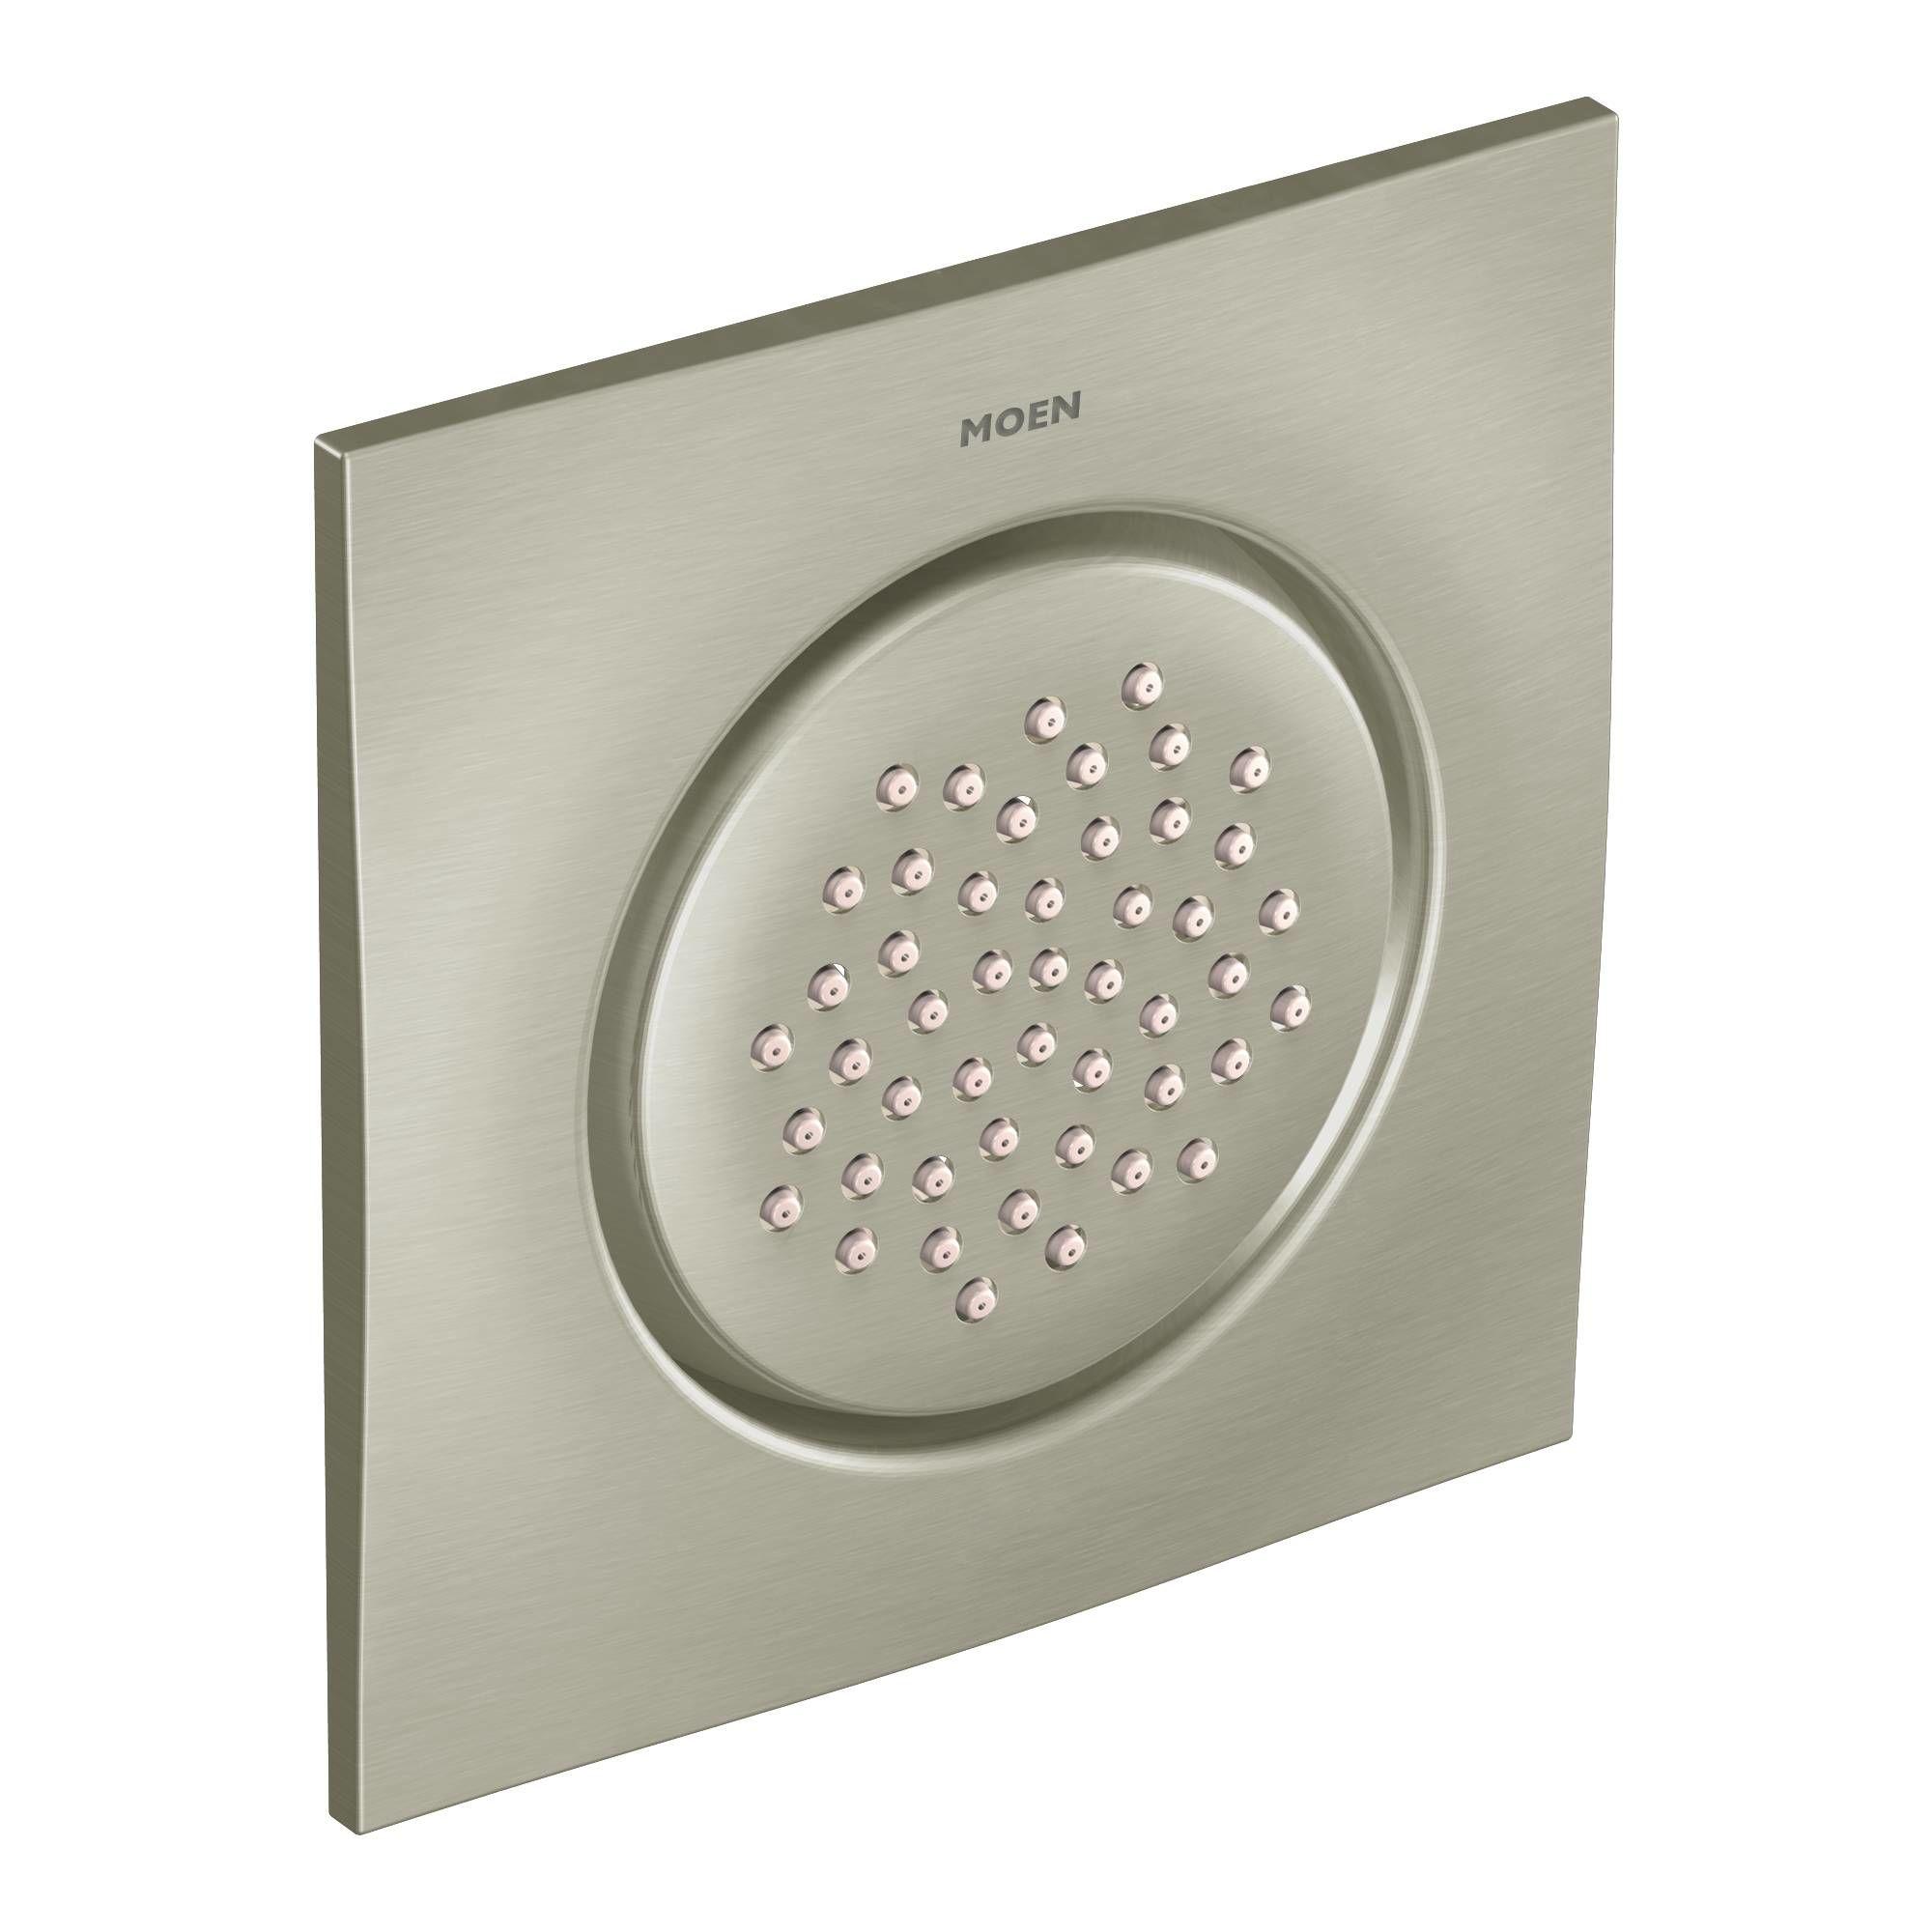 moen bn brushed nickel shower system with rain moen rain shower head ceiling